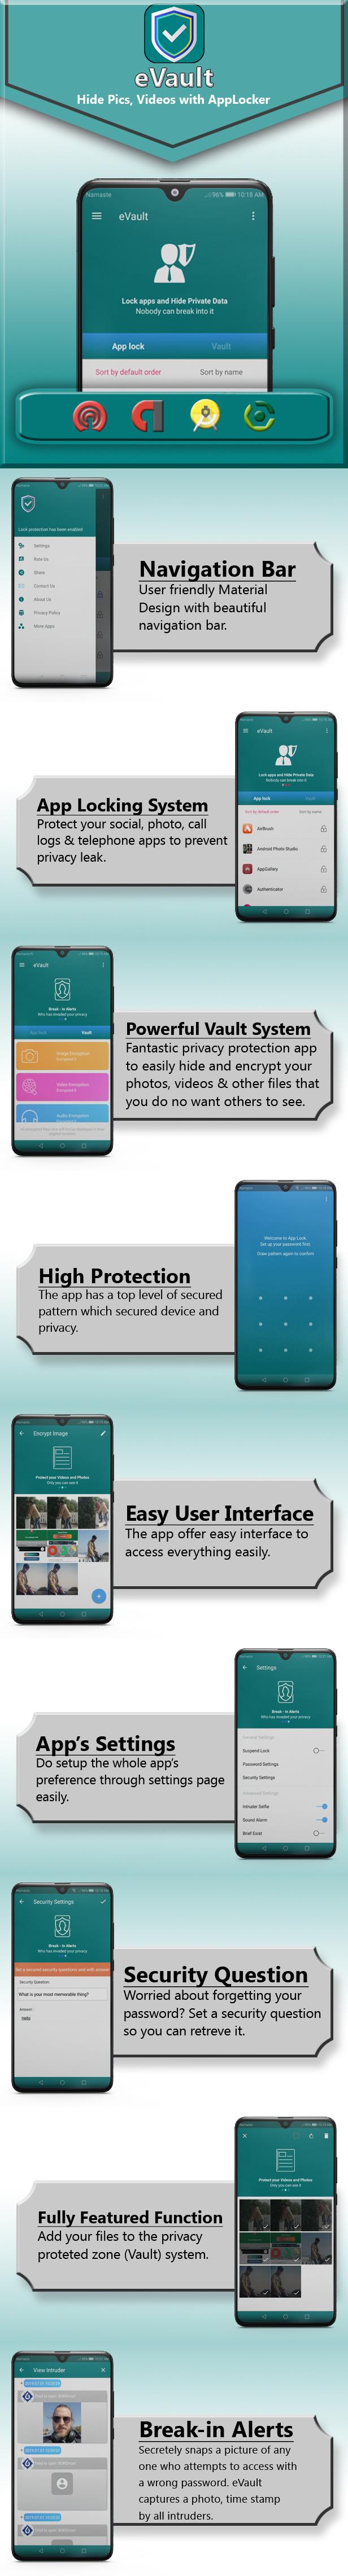 eVault - Hide Pics, Videos with AppLocker | Beautiful UI, Ads Slider, Admob, Push Notification - 6